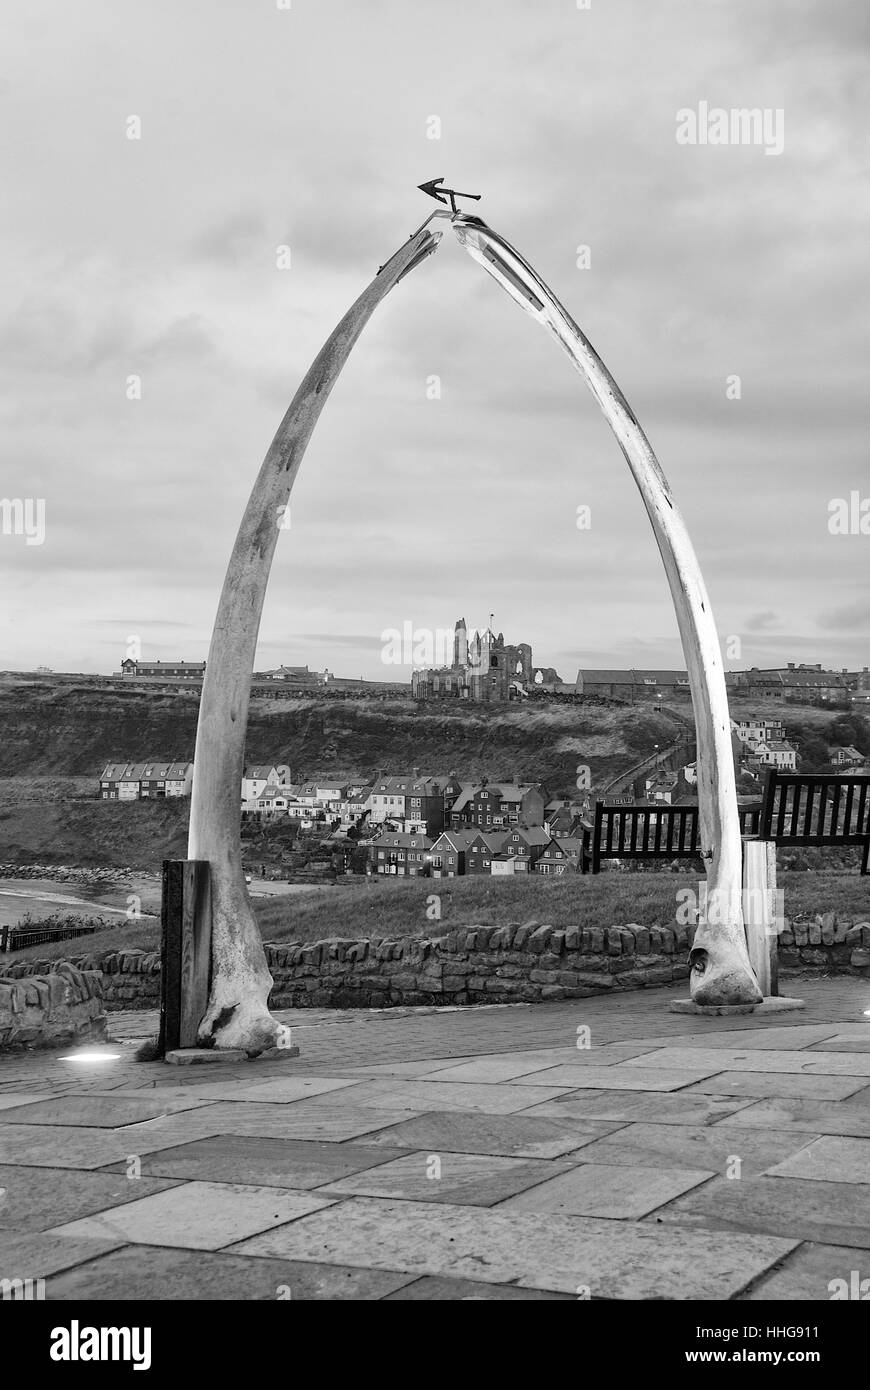 Whalebone Arch Whitby Stock Photos & Whalebone Arch Whitby Stock ...